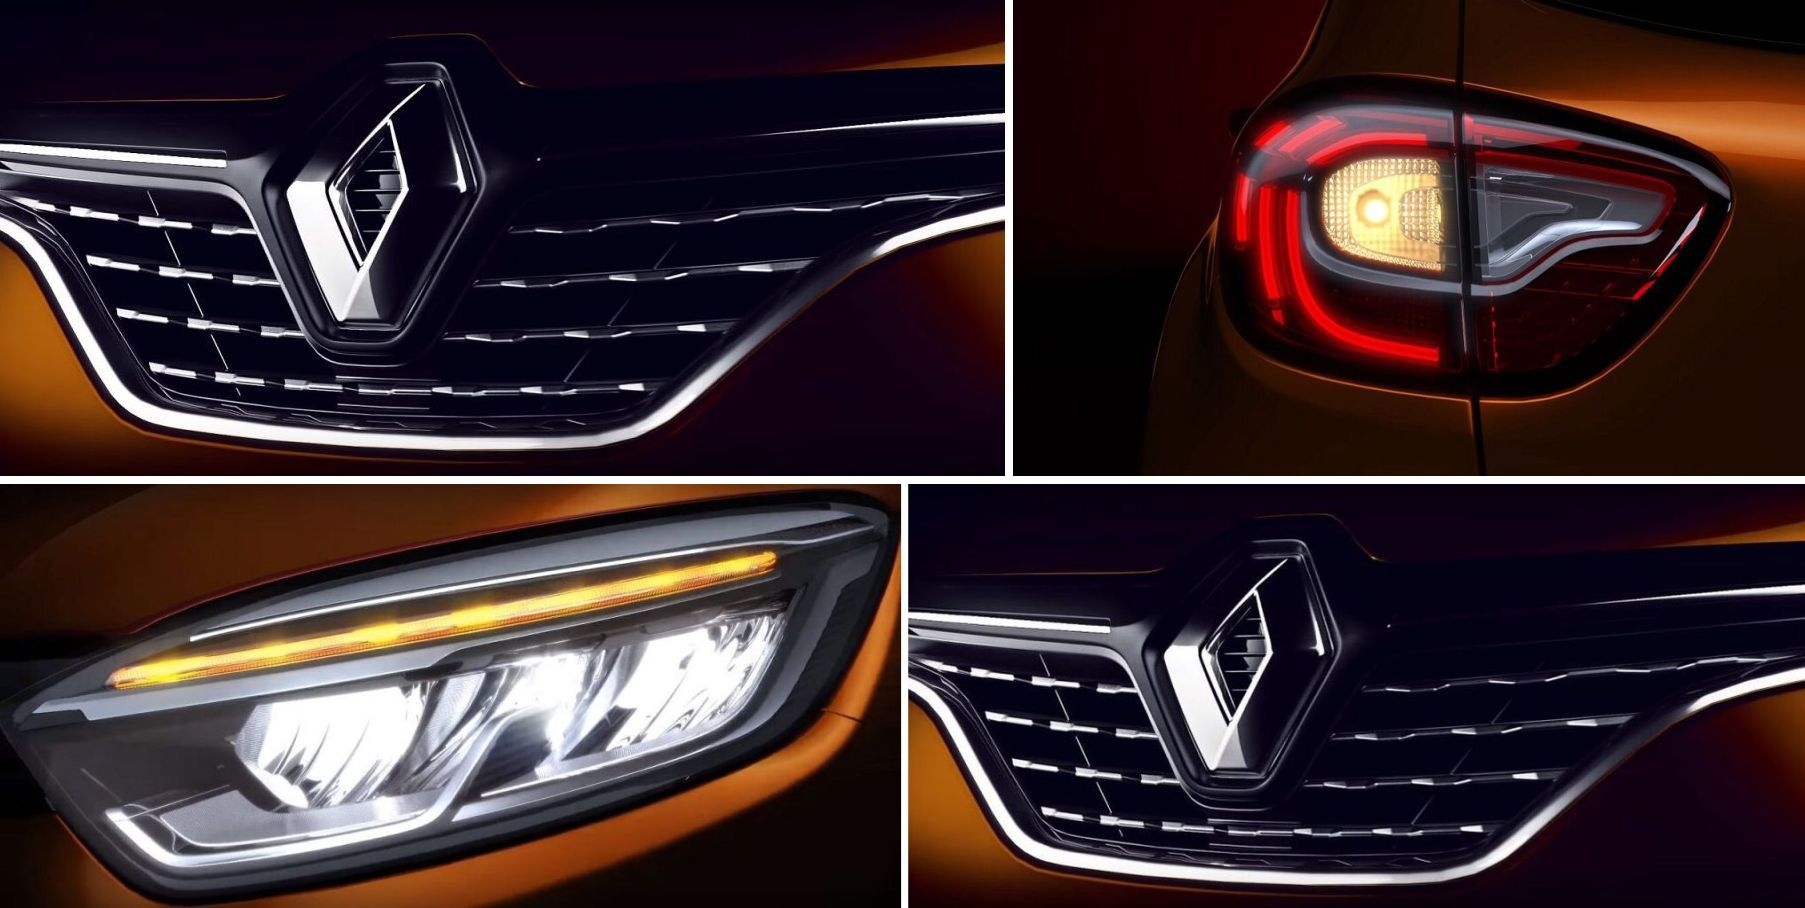 Renault-captur-teased-India-launch-september-2017